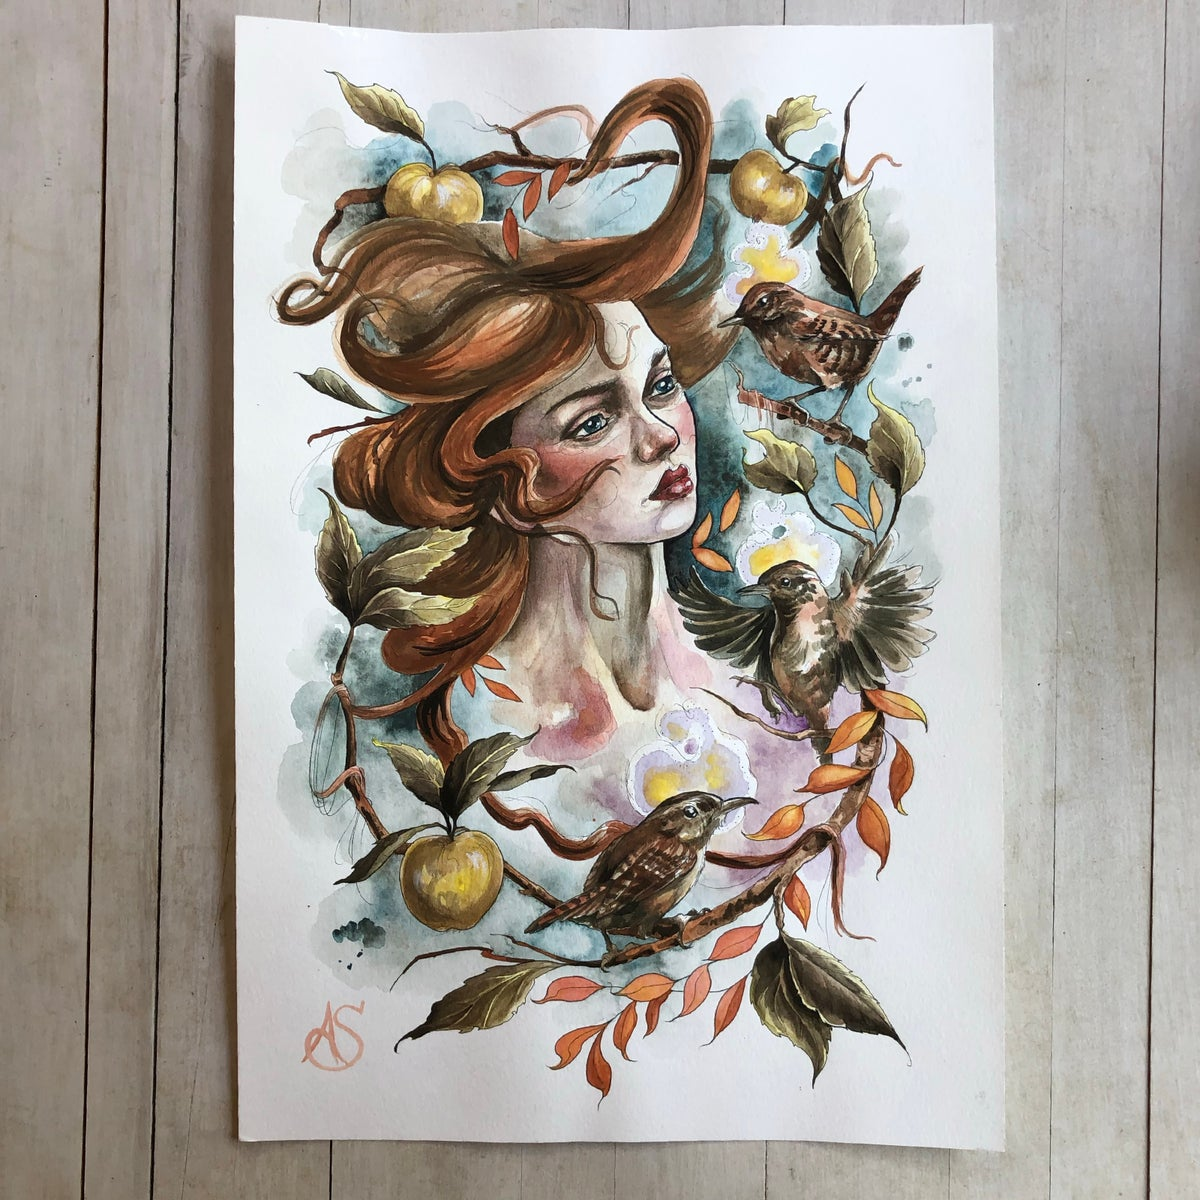 Cliodhna | Original Watercolor Painting